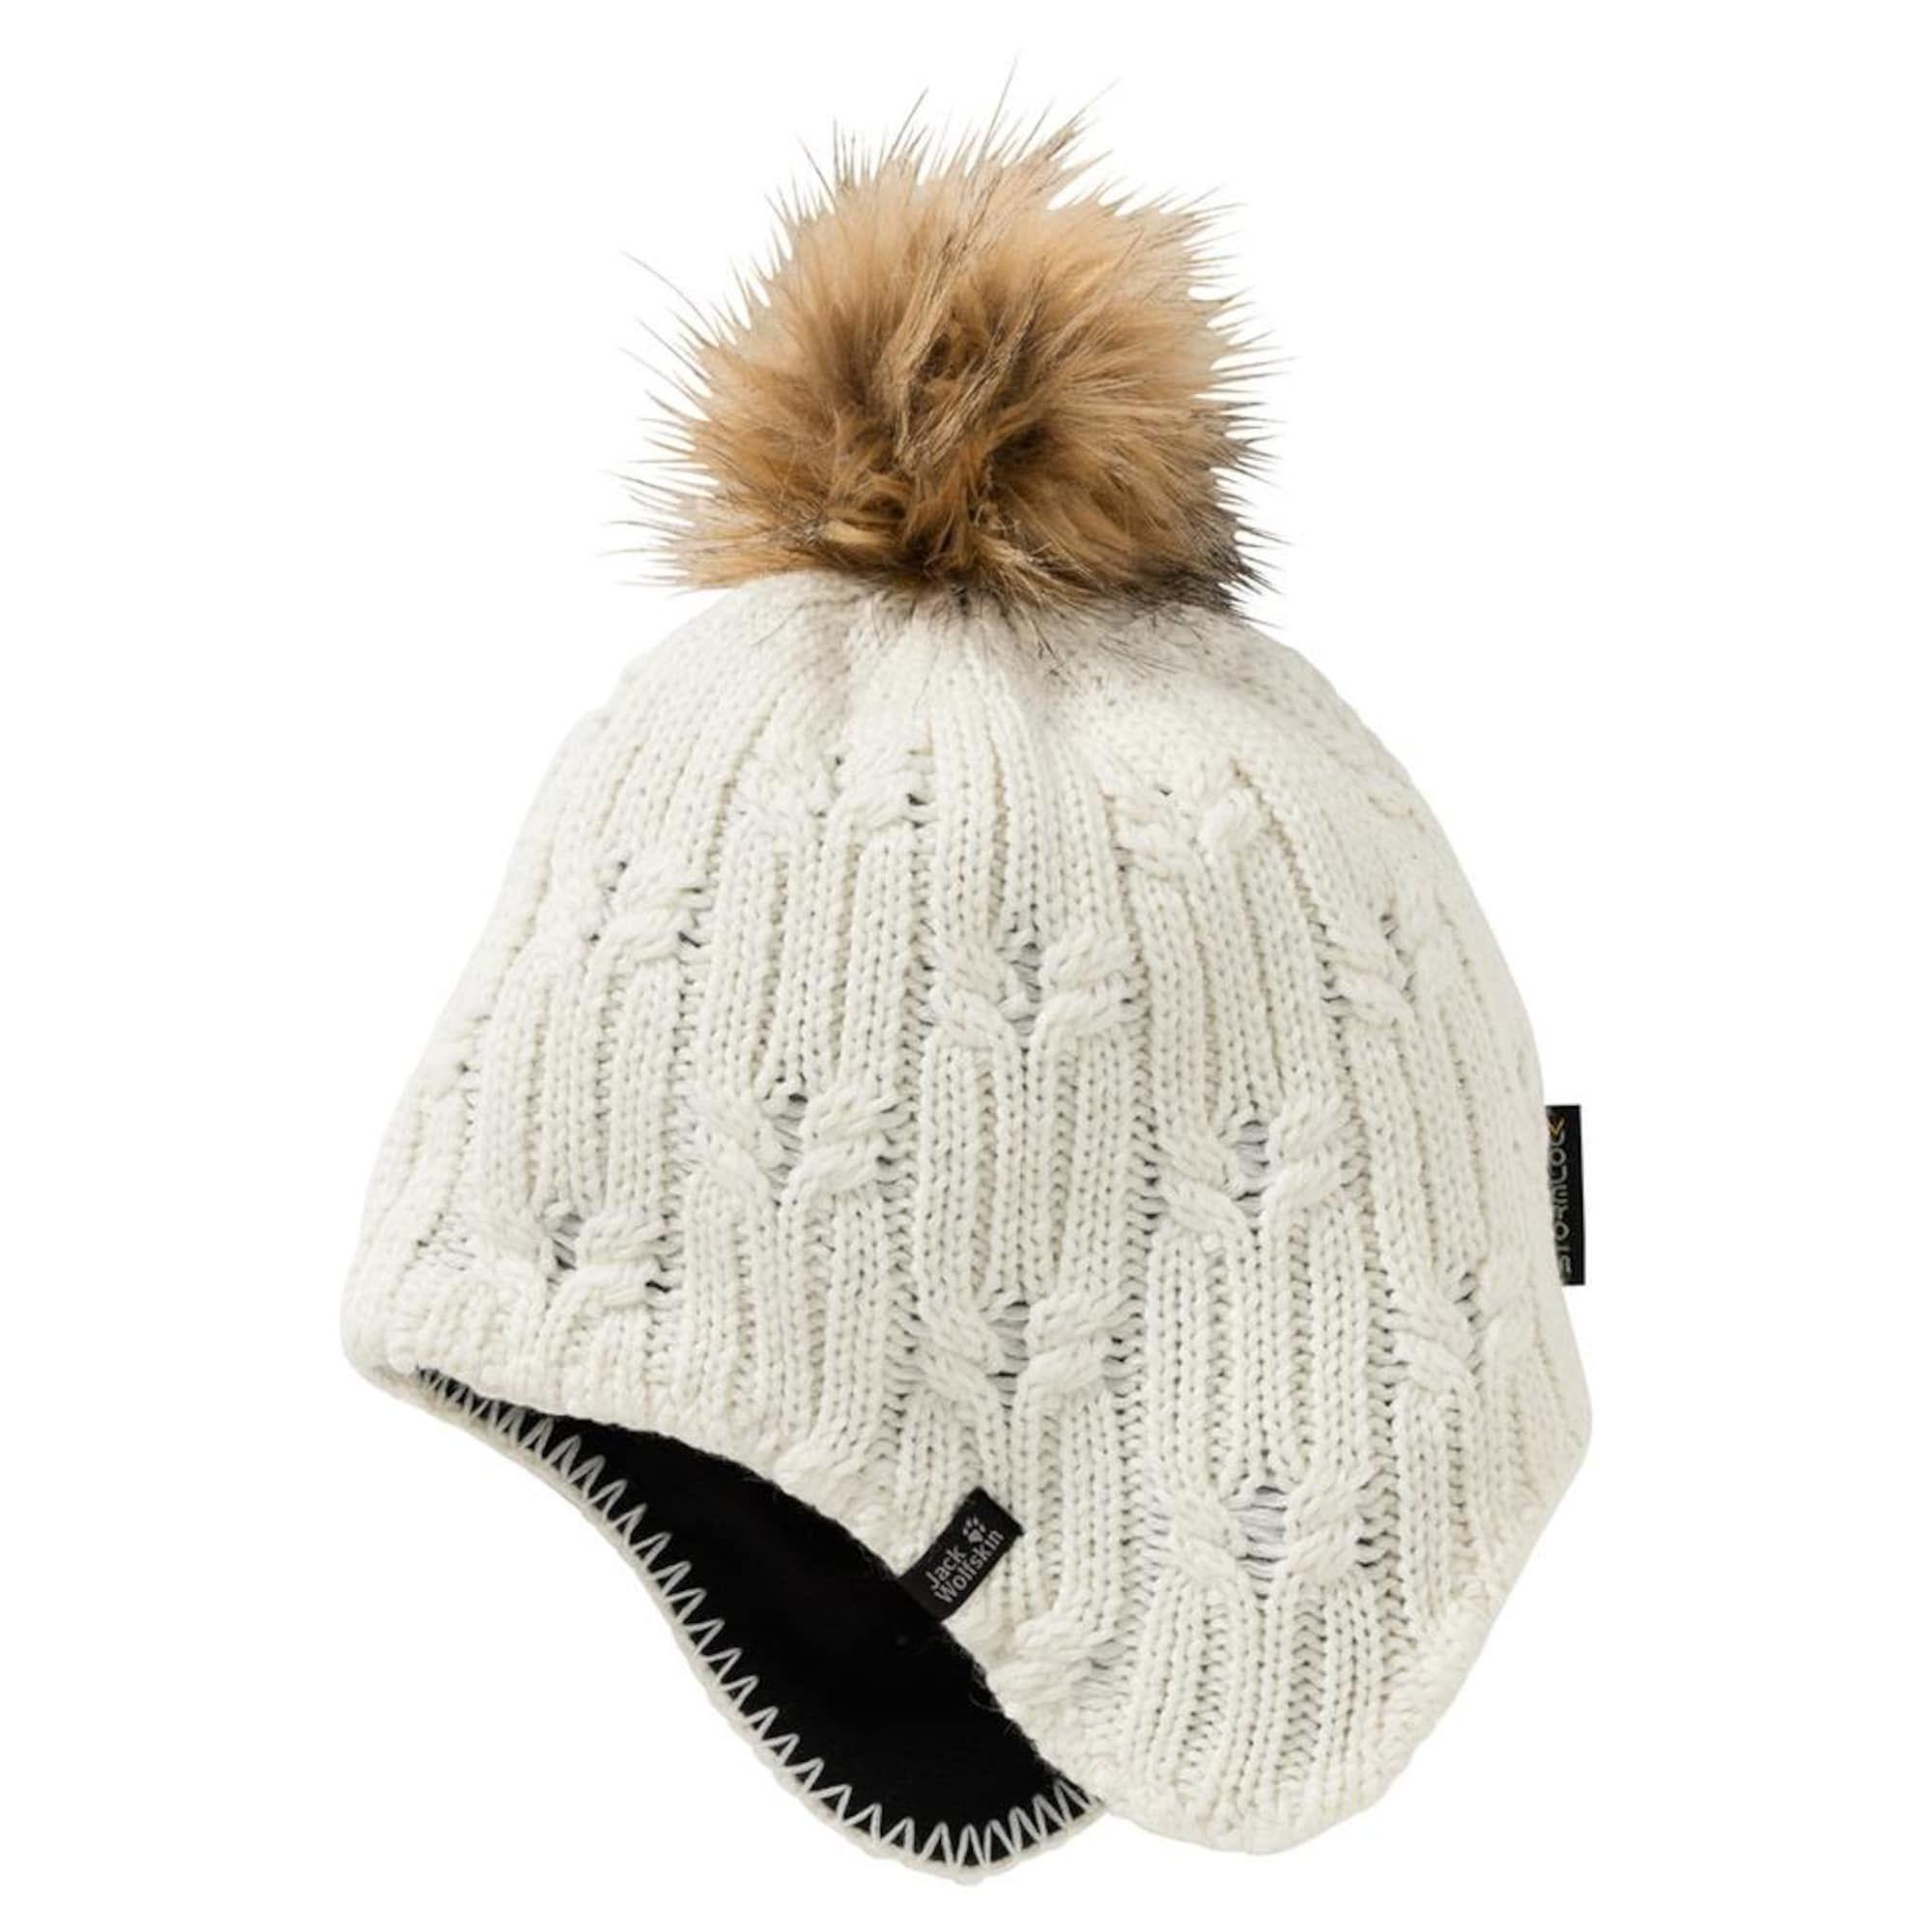 Bommelmütze ´STORMLOCK BRAID CAP WOMEN´